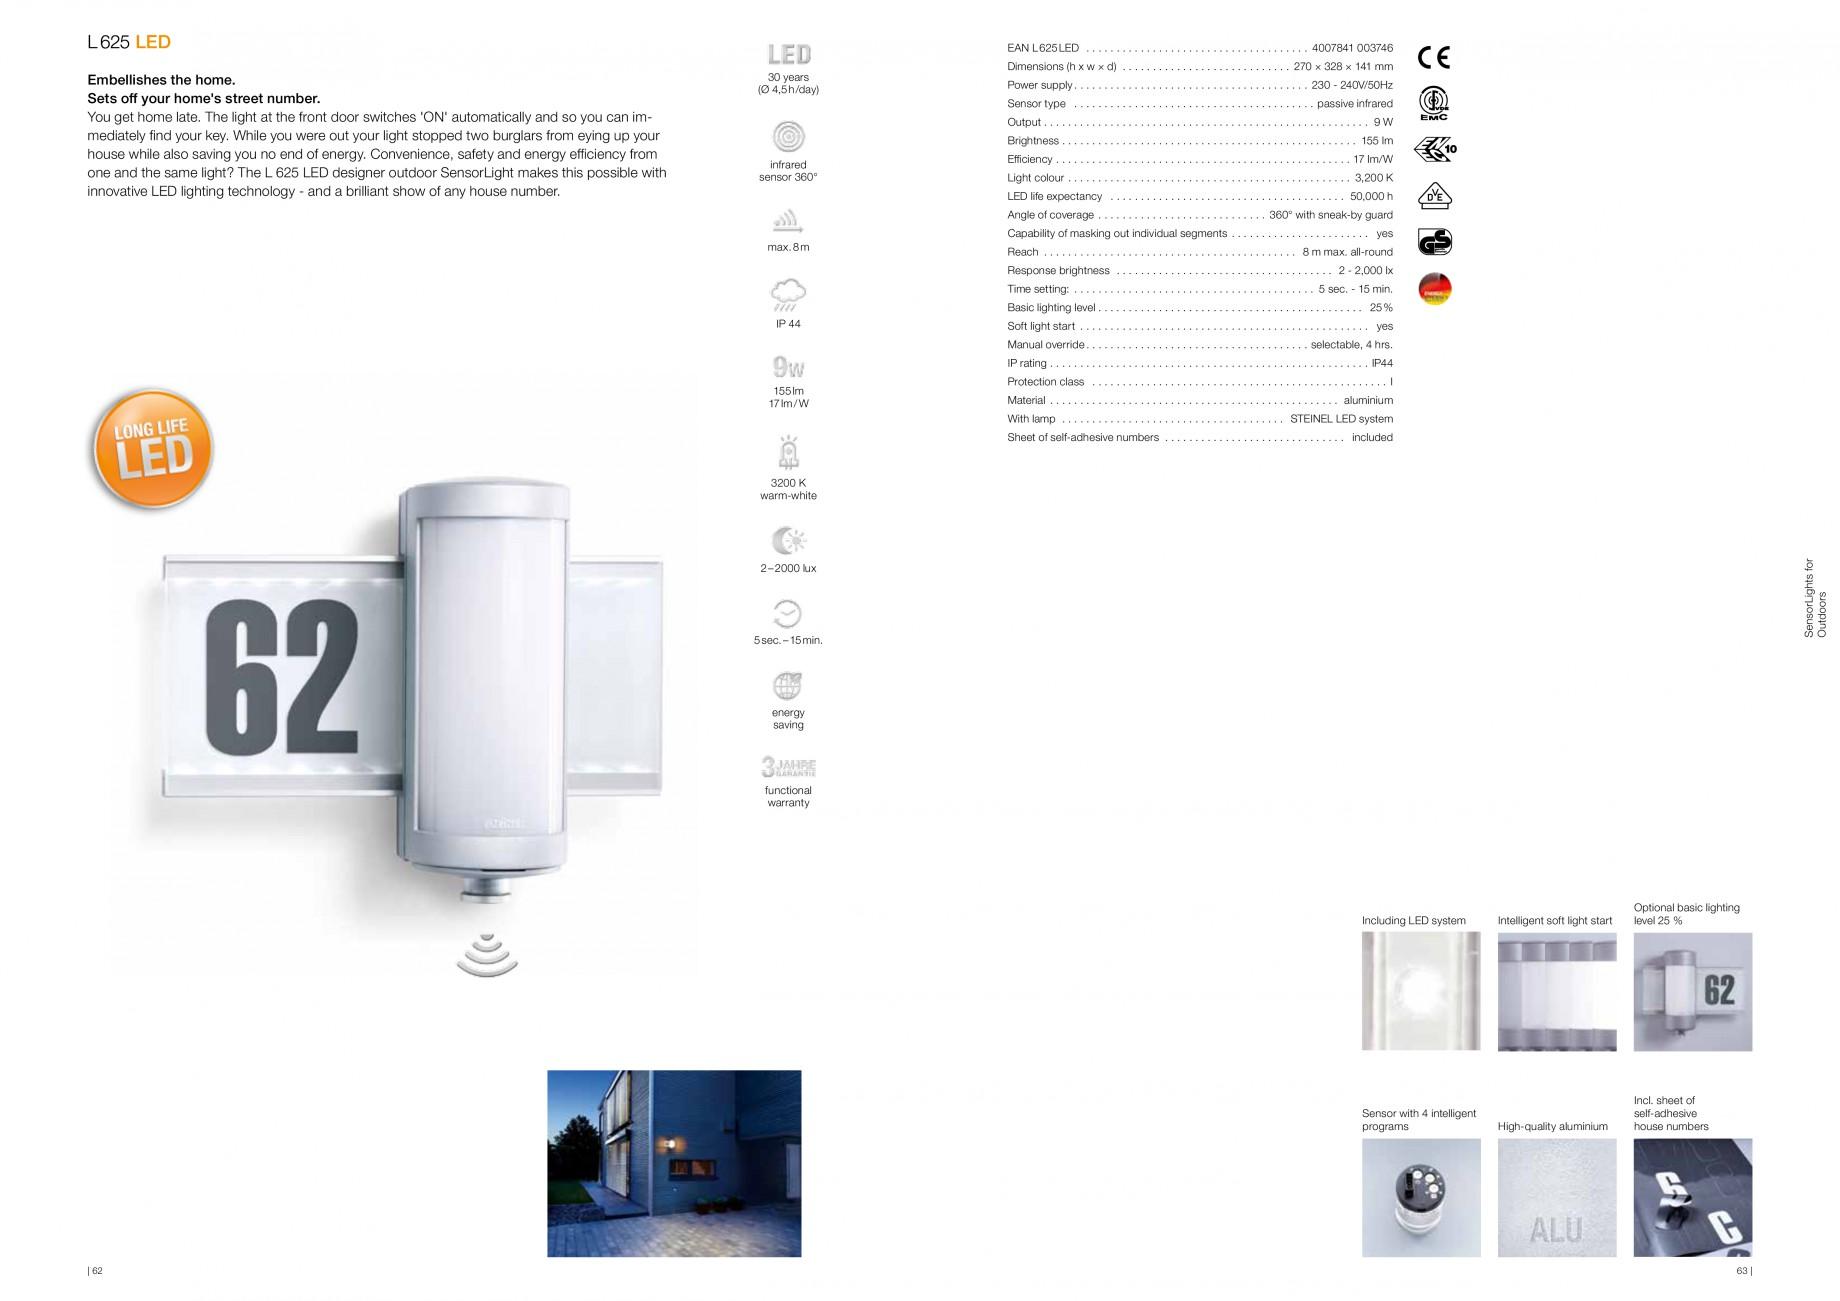 fisa tehnica lampa de exterior cu led si senzor miscare l. Black Bedroom Furniture Sets. Home Design Ideas